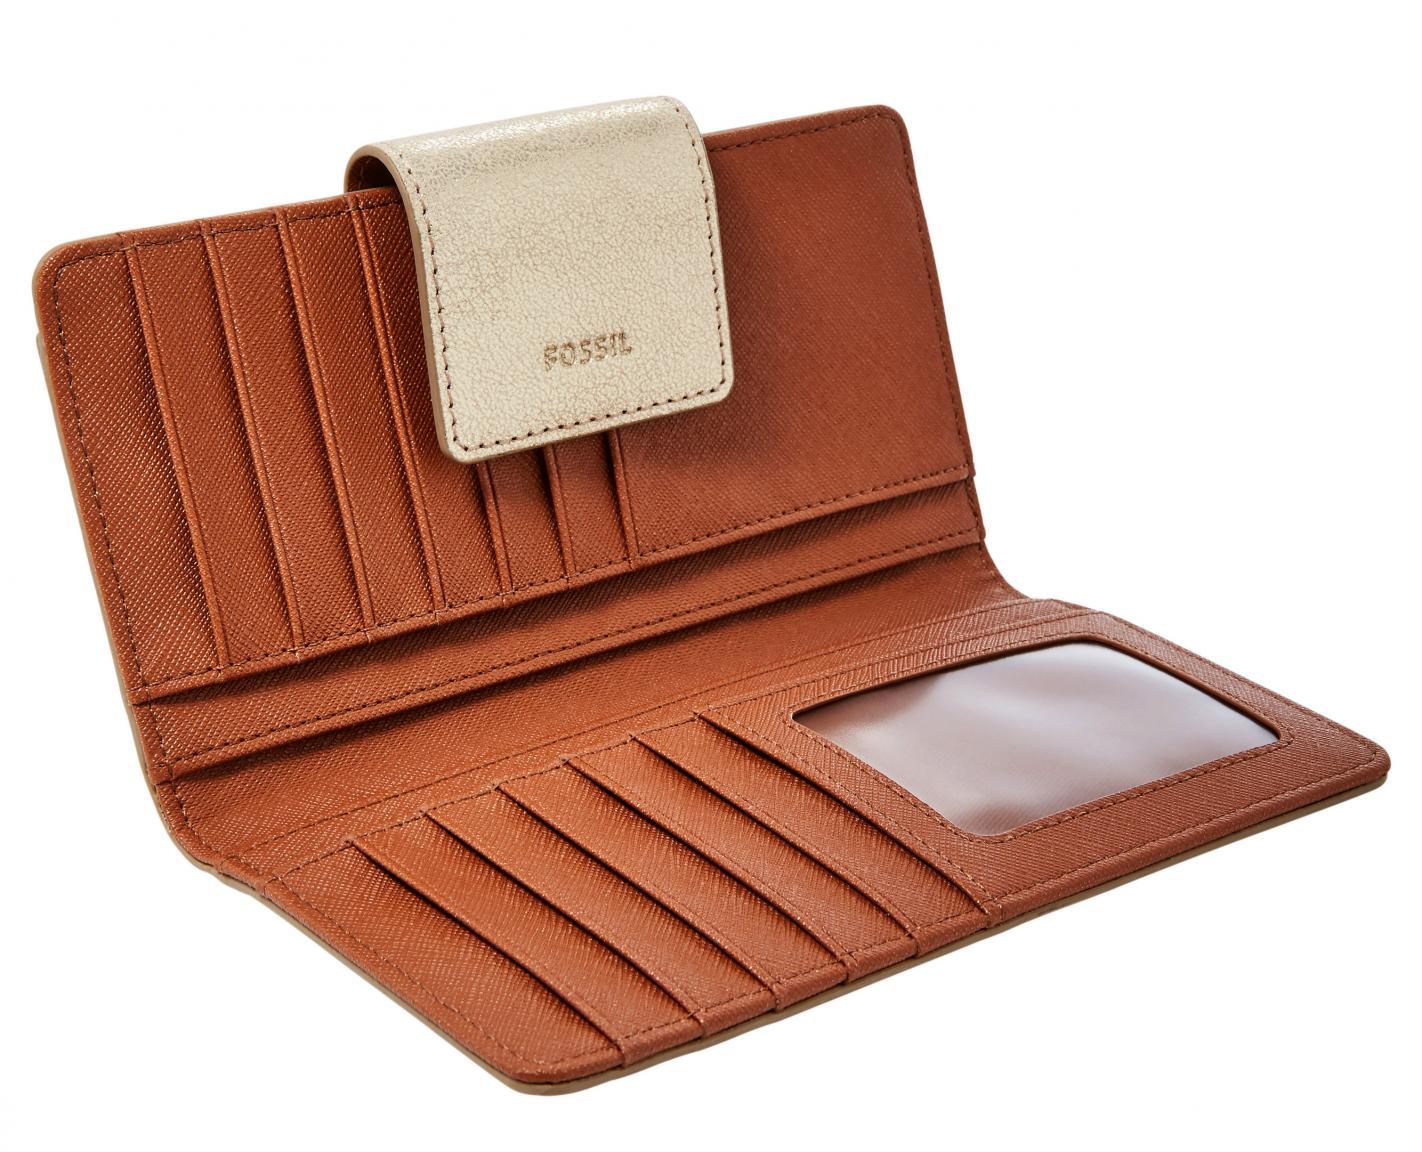 d5034bc21c21b Fossil Portemonnaie Emma Tab RFID Pale Gold Metallic - Bags   more